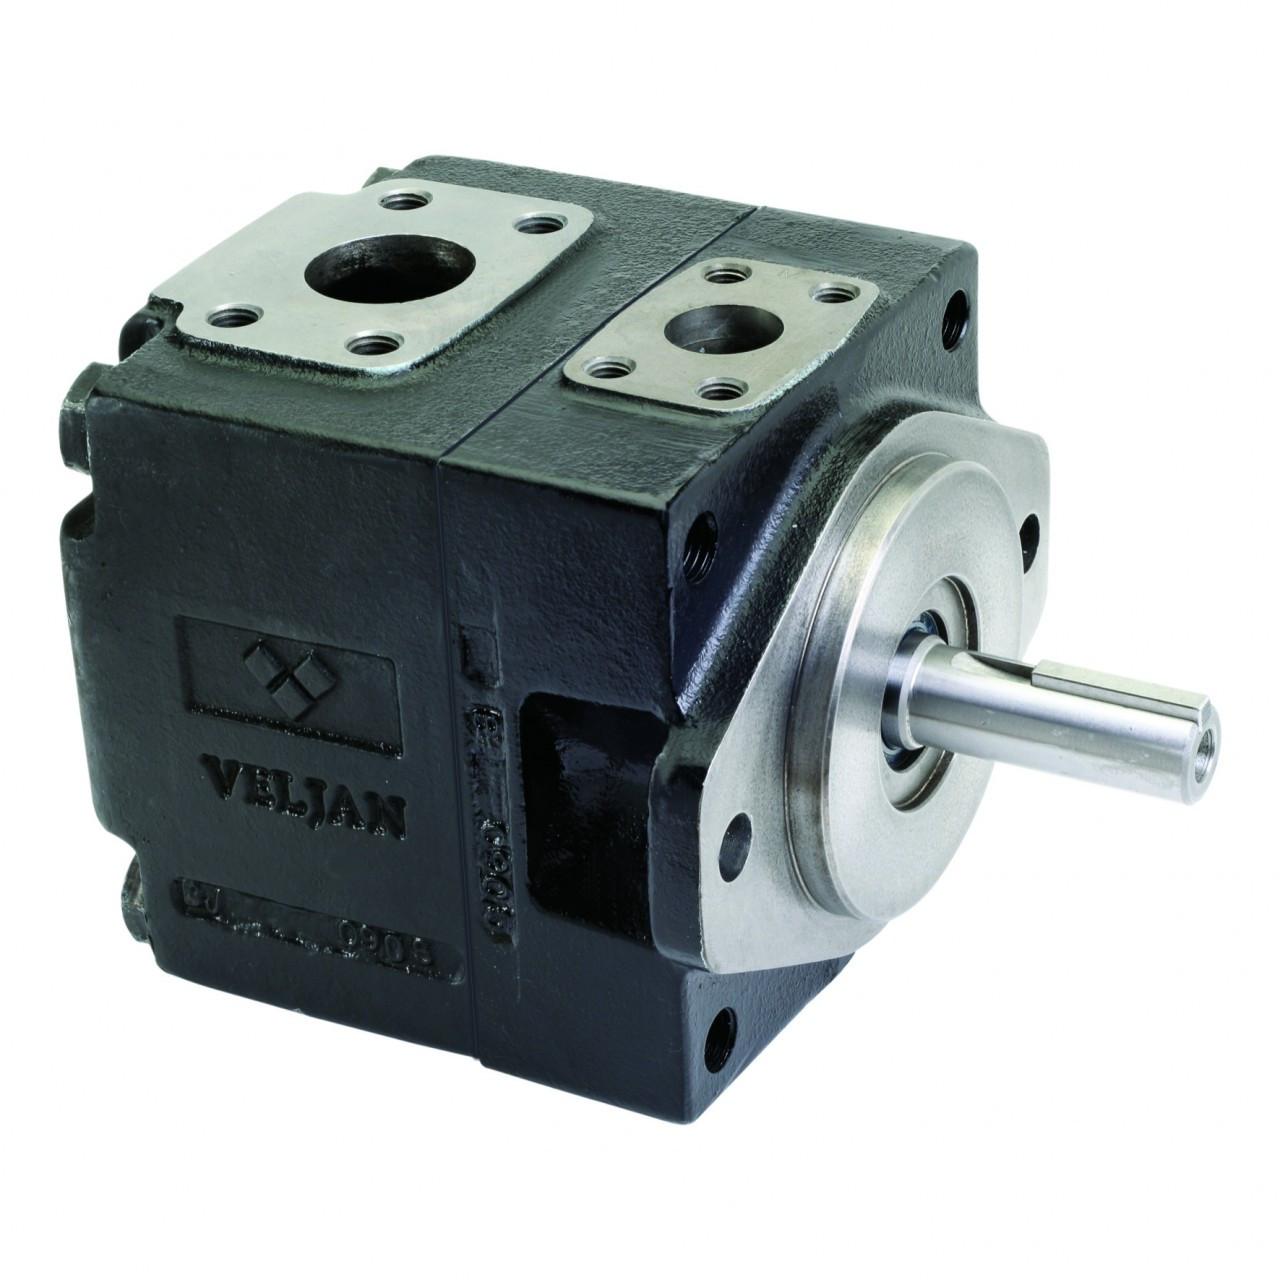 Veljan Single Vane Pump - VT7QC1 / VTQC2 - Rons Drivelines | Drivelines | Driveshafts